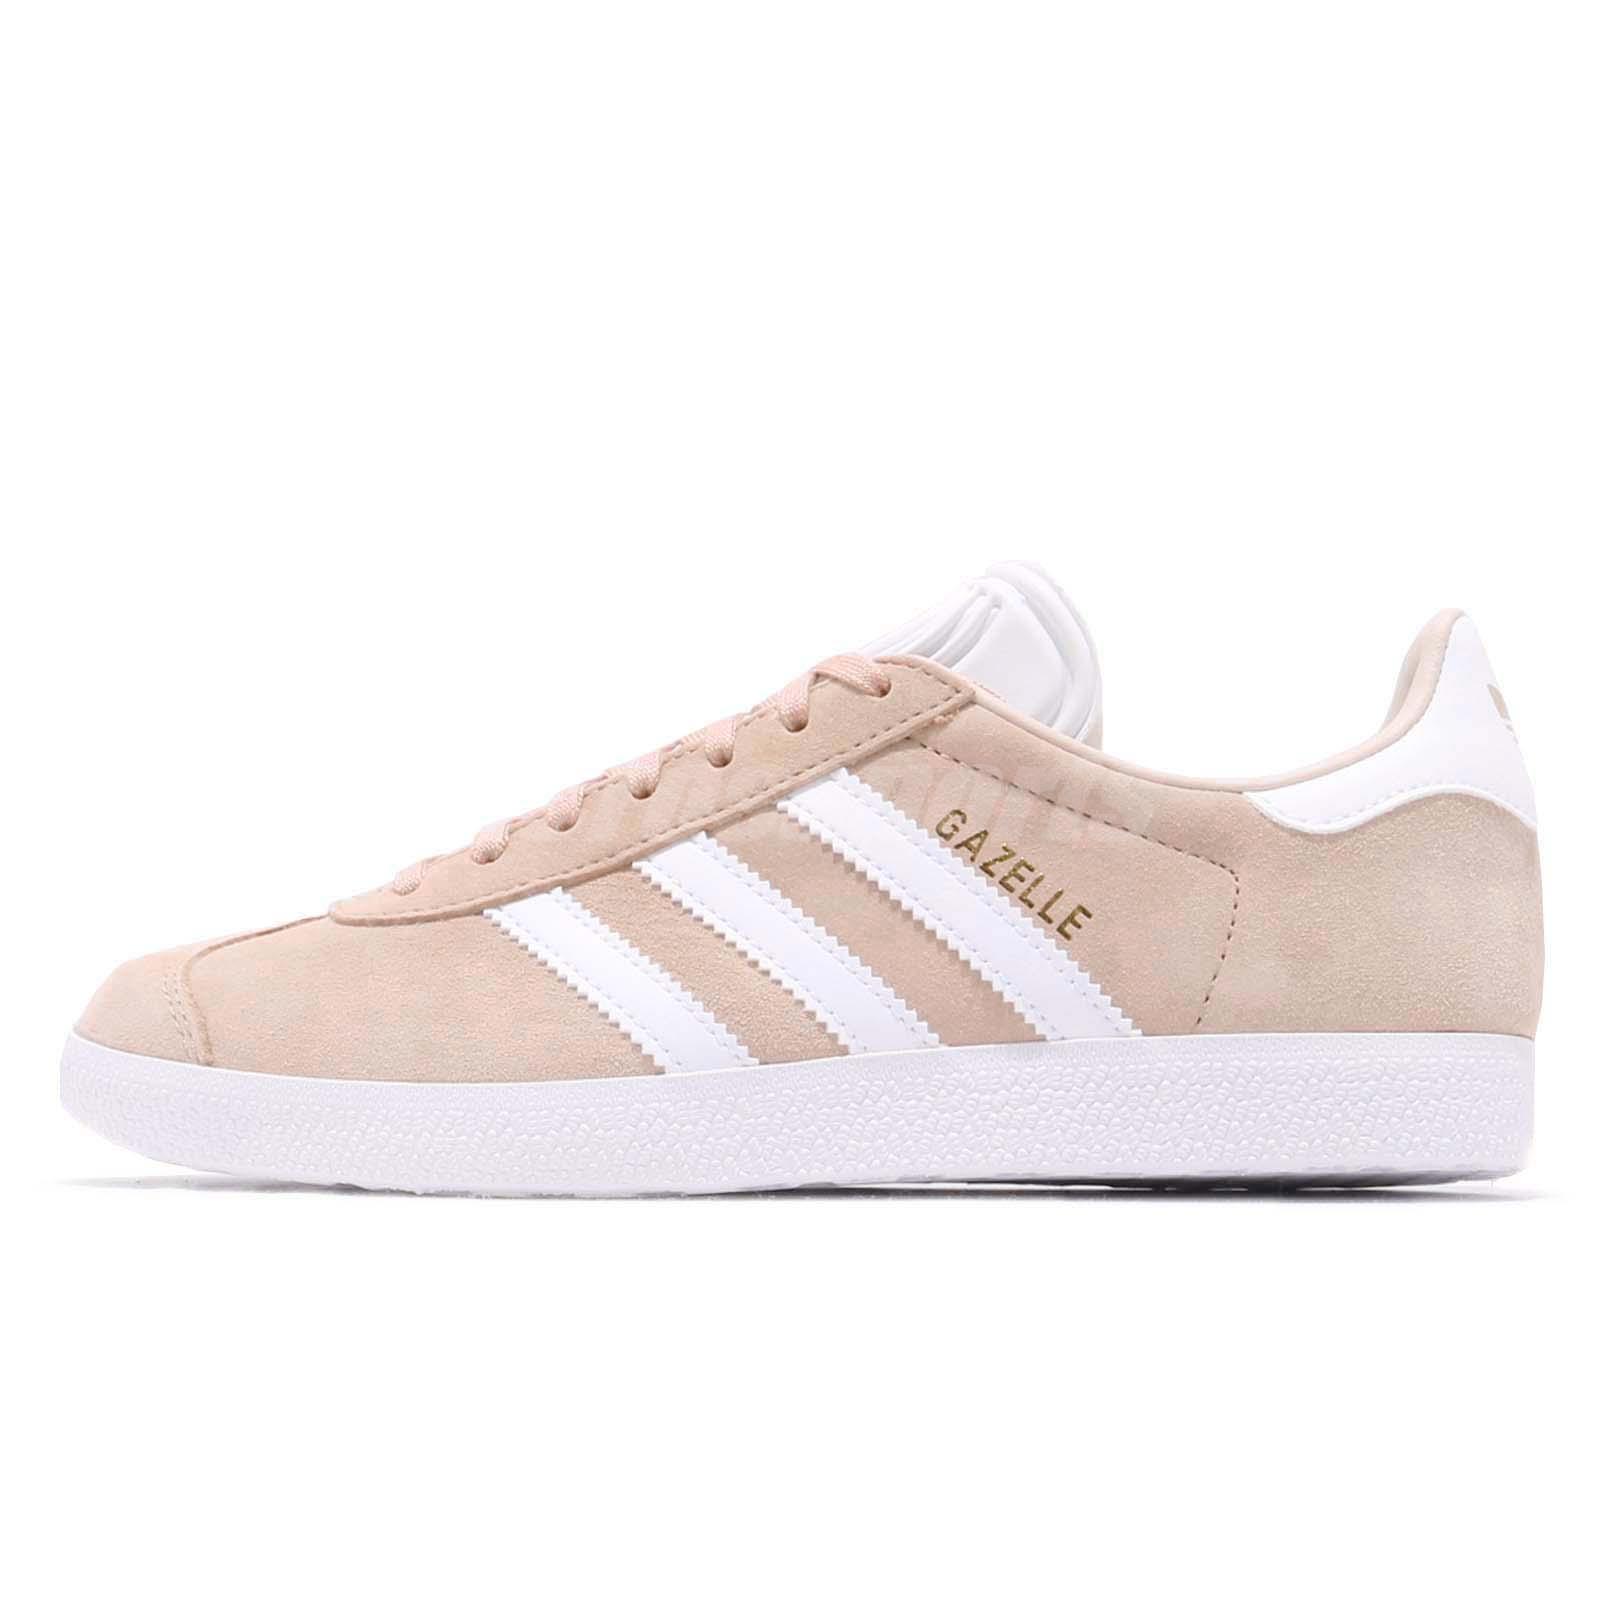 adidas Originals Gazelle W Ash Pearl White Women Casual Shoes Sneakers  B41660 cb5cf932e